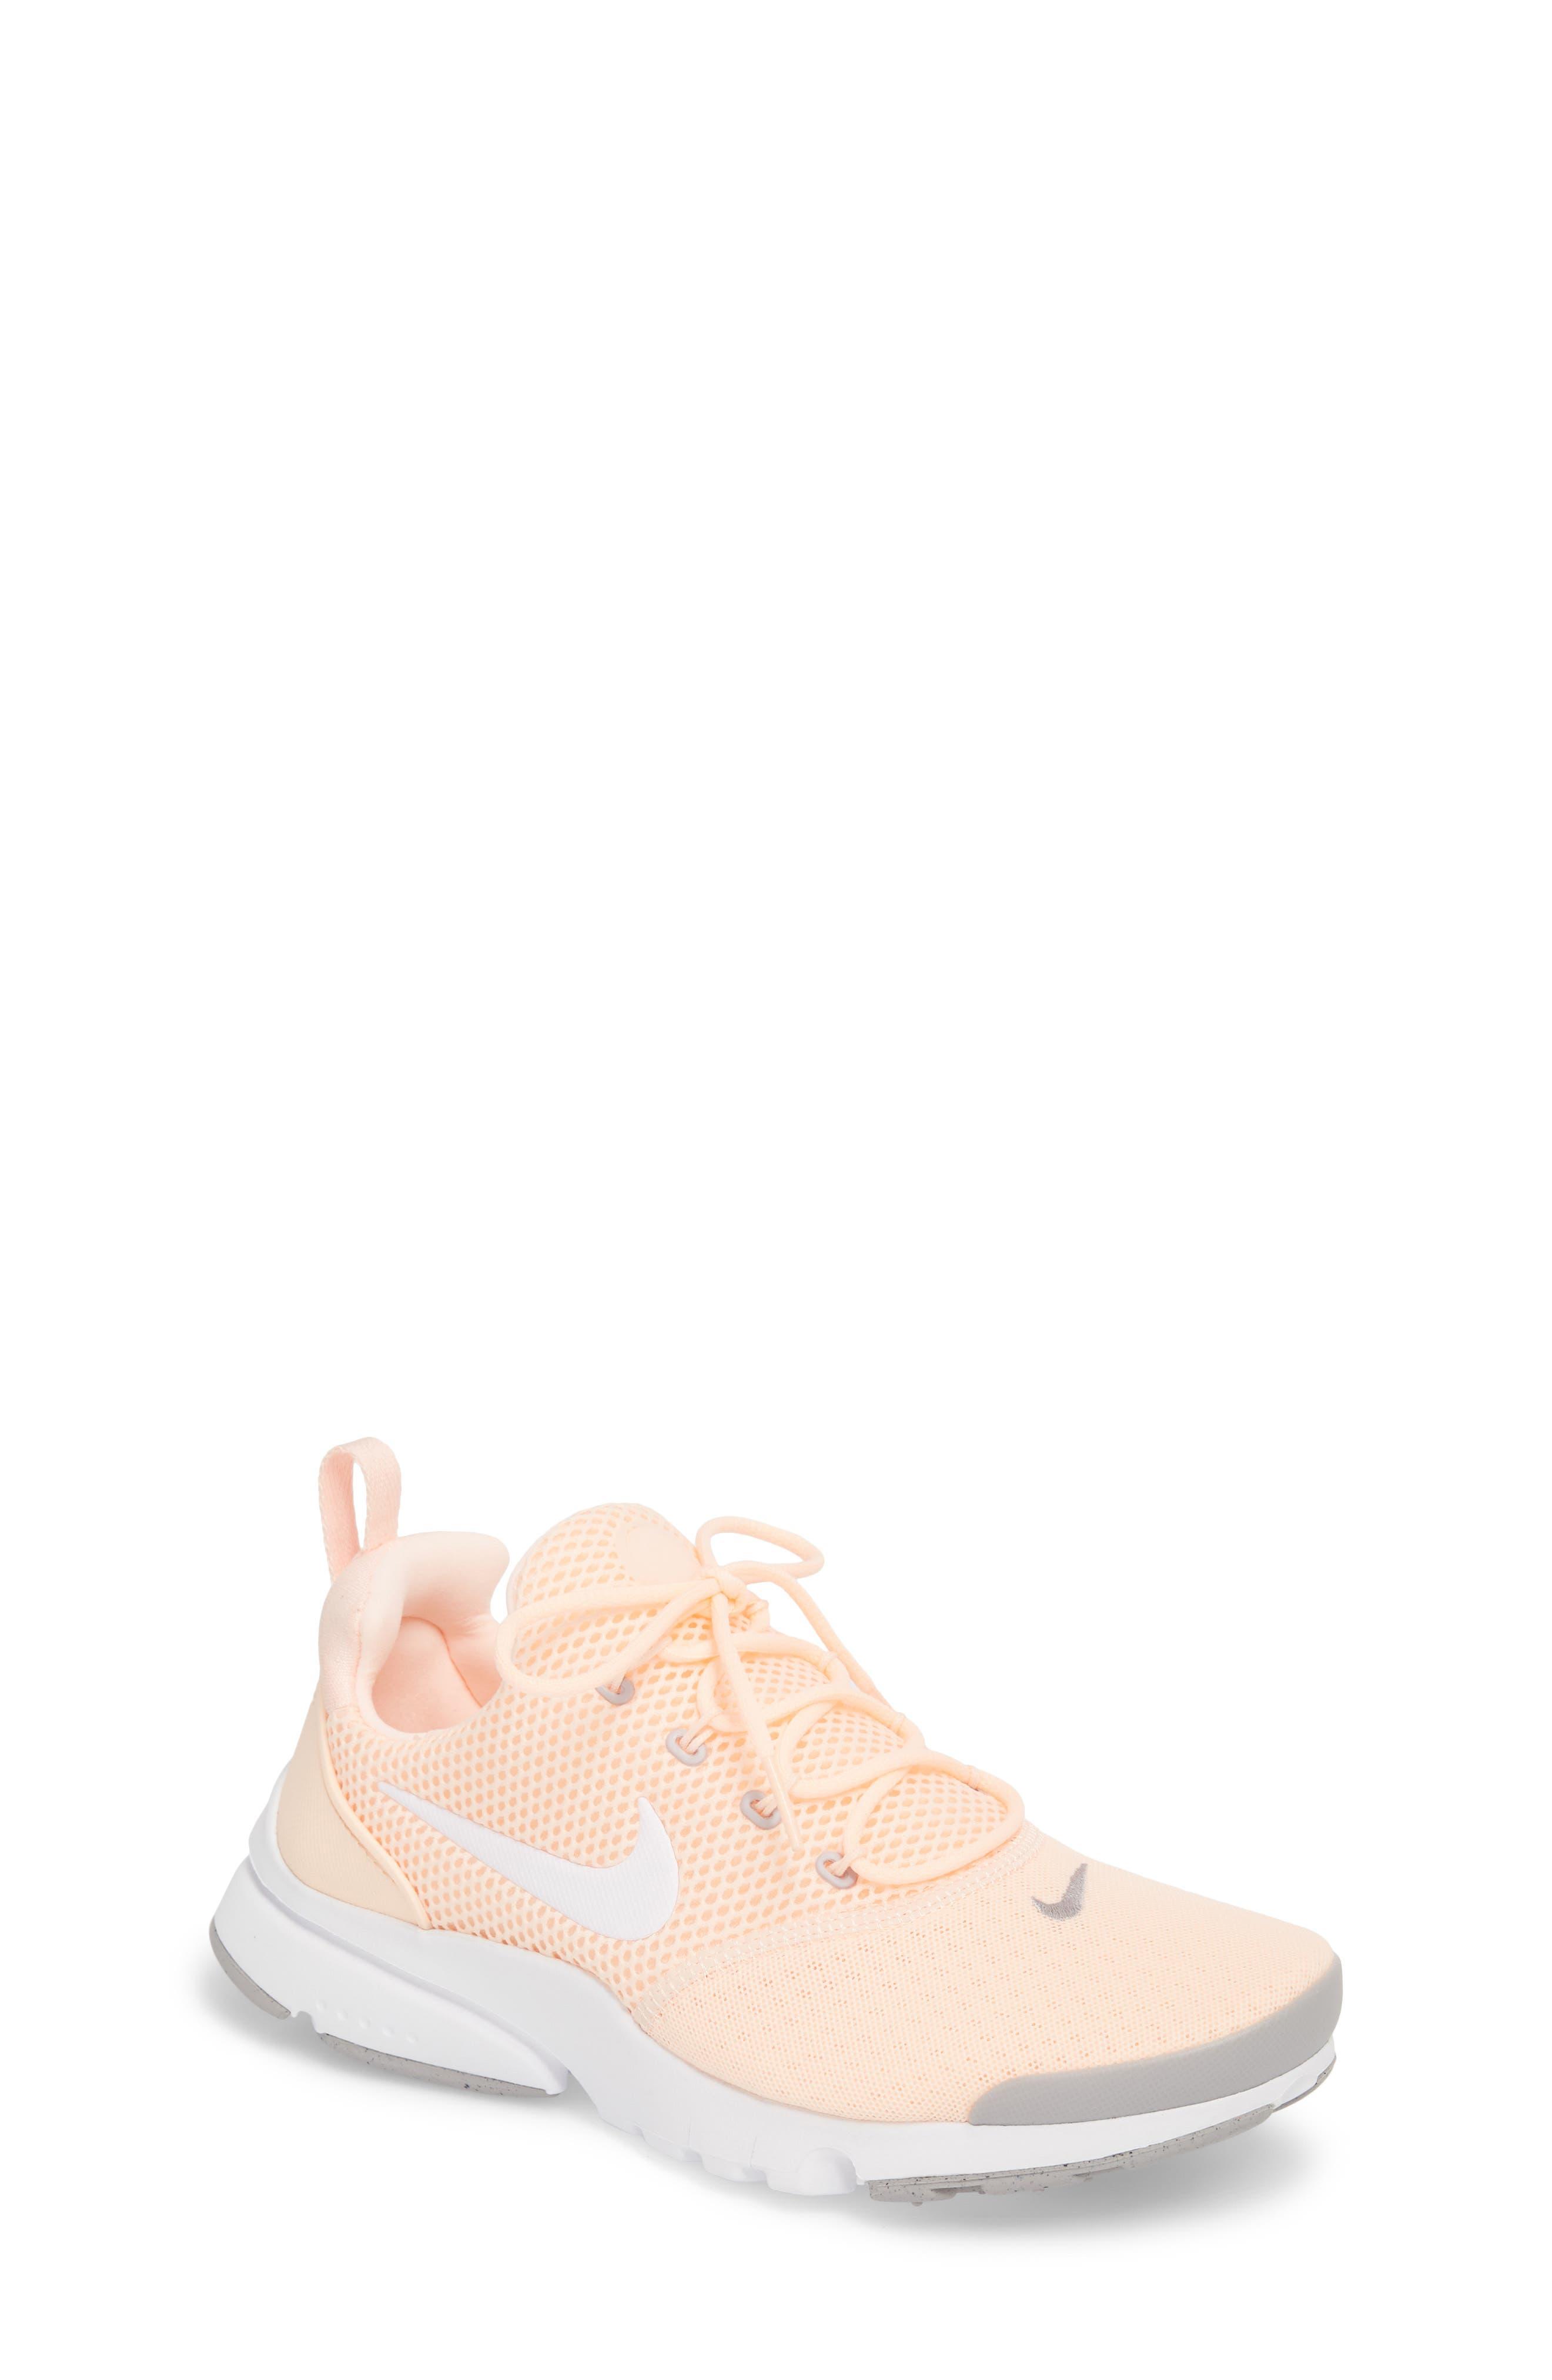 Presto Fly Sneaker,                             Main thumbnail 1, color,                             Crimson Tint/ White/ Grey